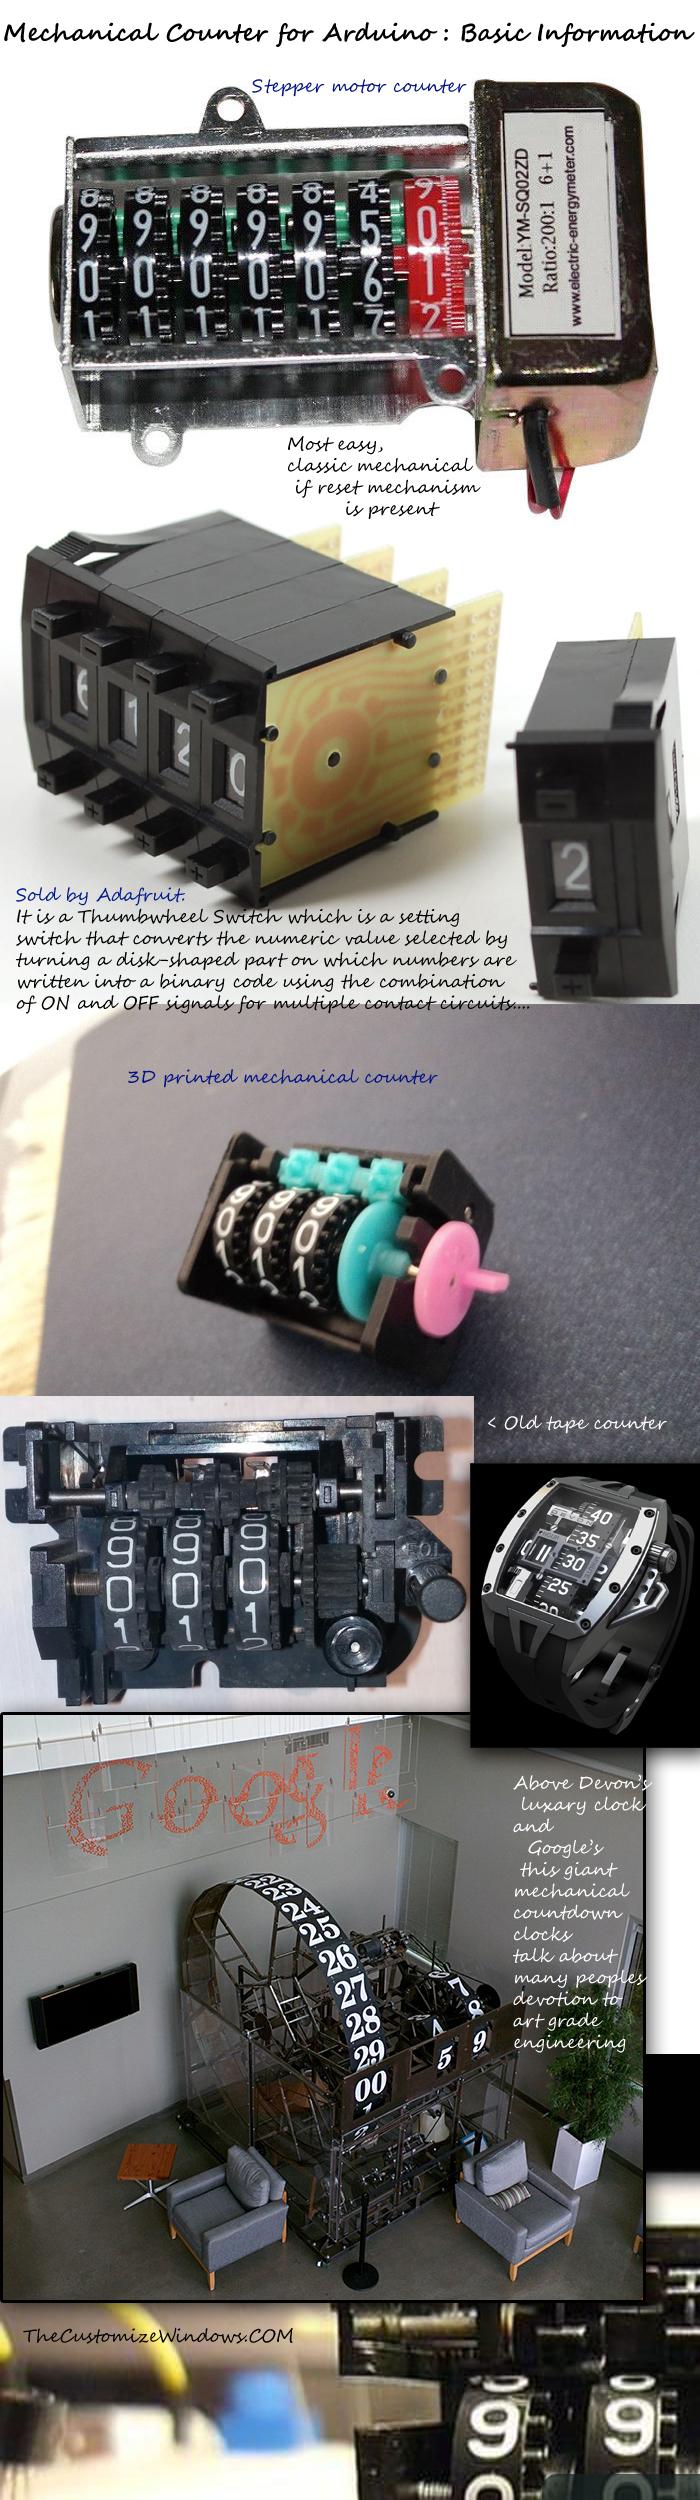 Mechanical-Counter-for-Arduino